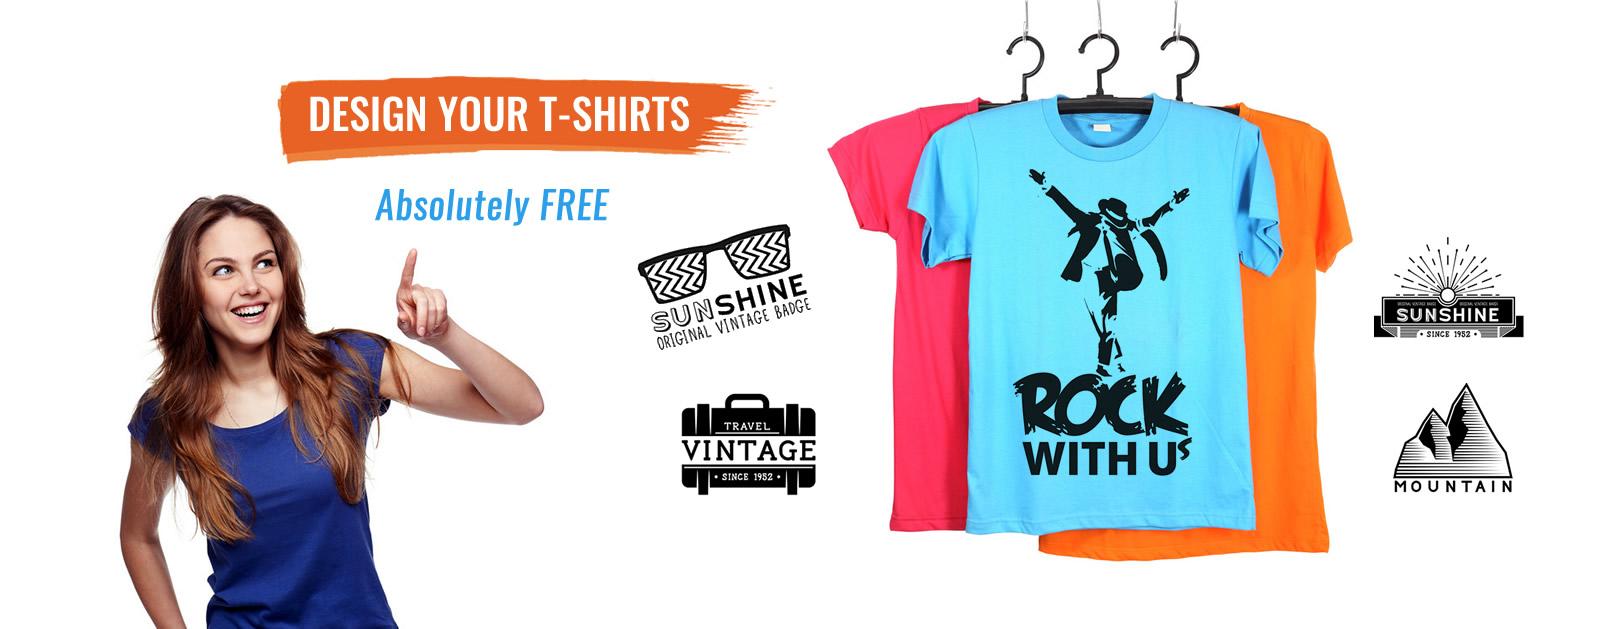 seattle t-shirt design